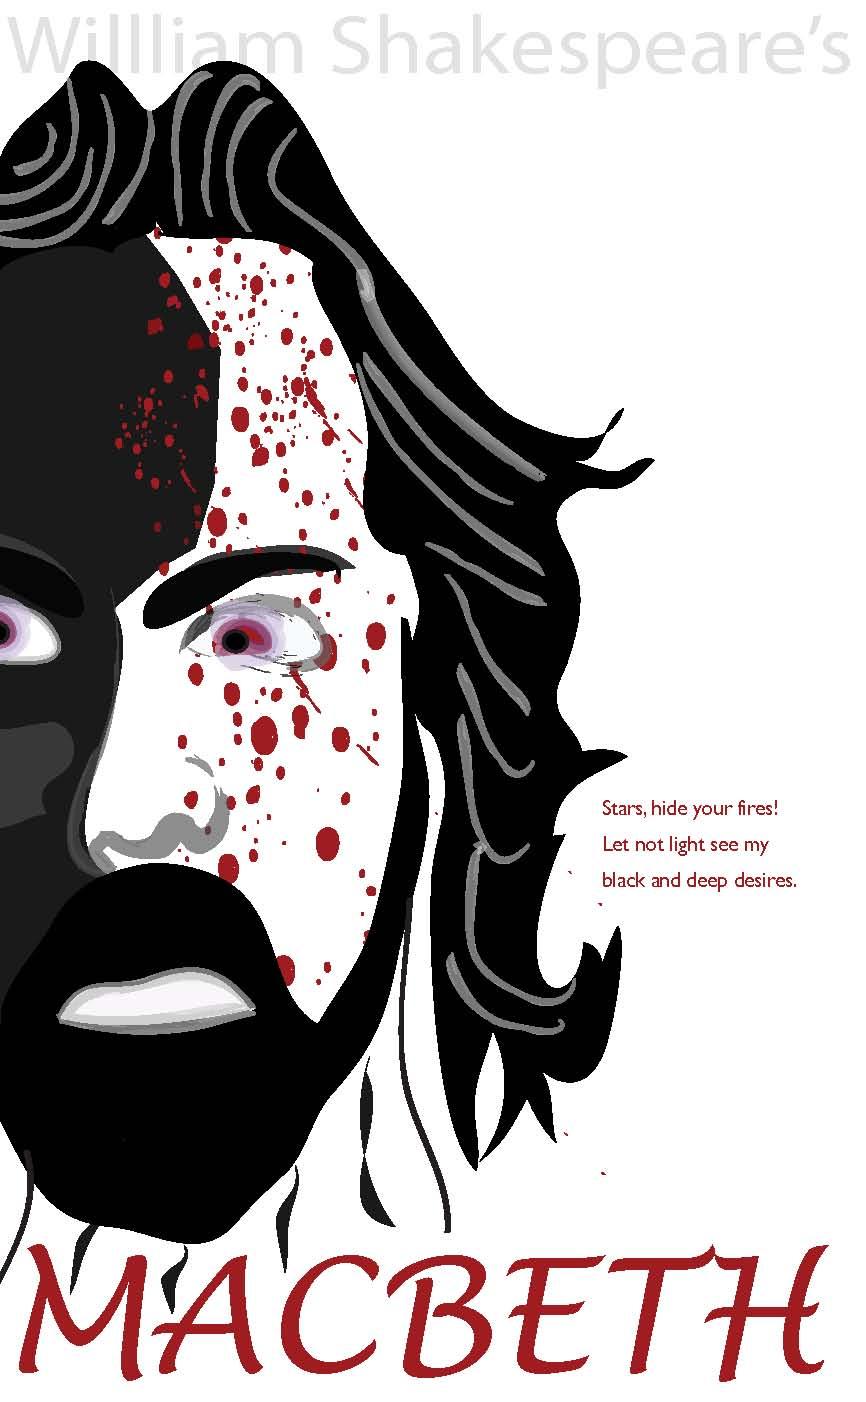 Book Cover - Macbeth by silentbean on DeviantArt